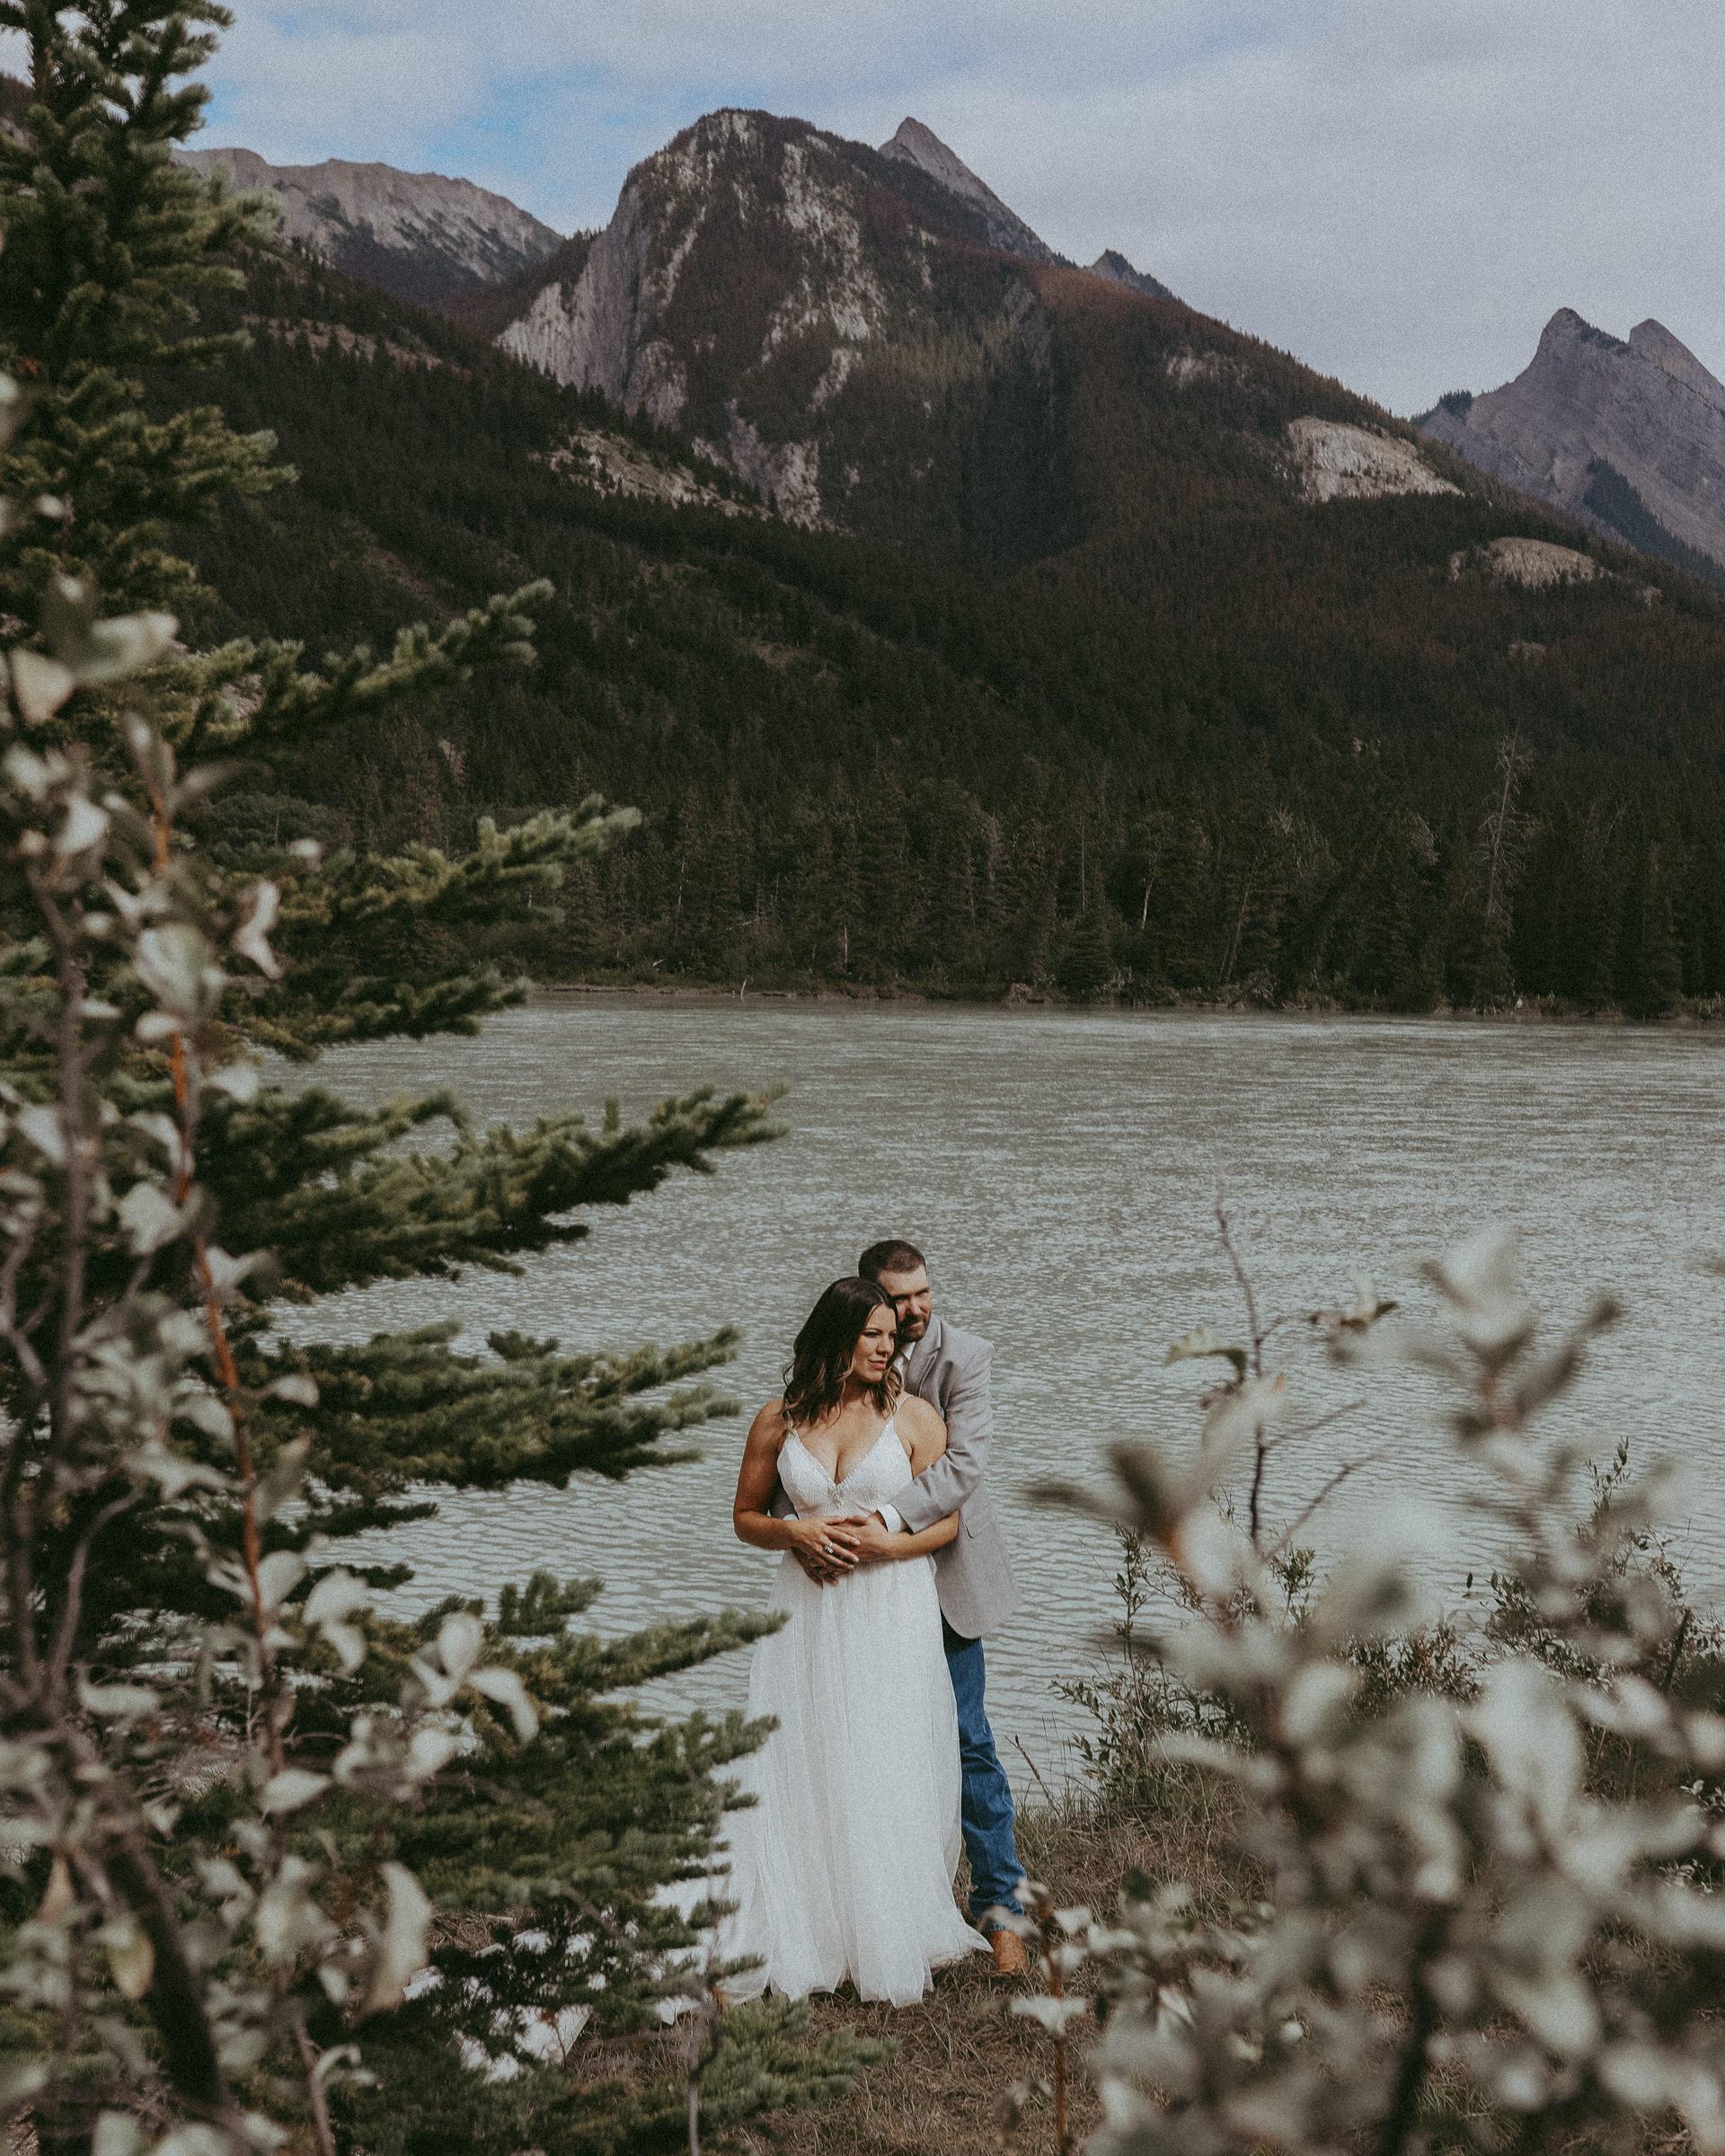 Jasper Day Use Area Wedding